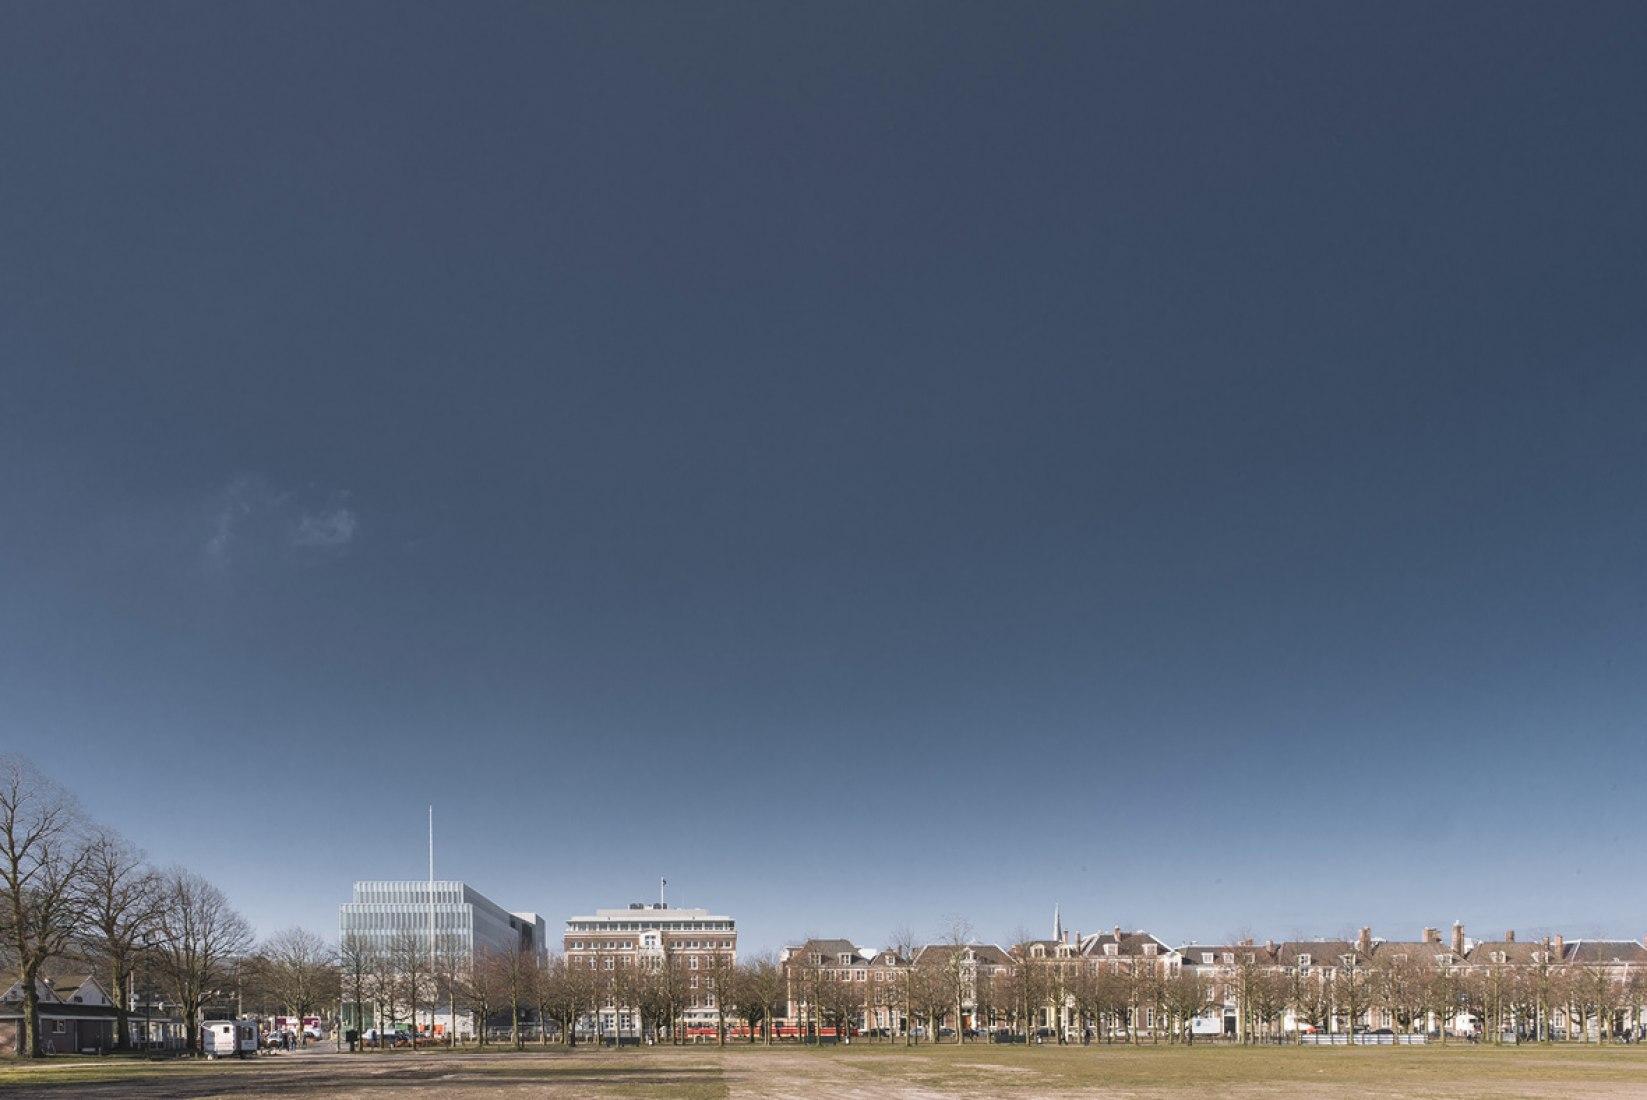 Context. The Supreme Court of the Netherlands by KAAN Architecten. Photograph © Sebastian van Damme.